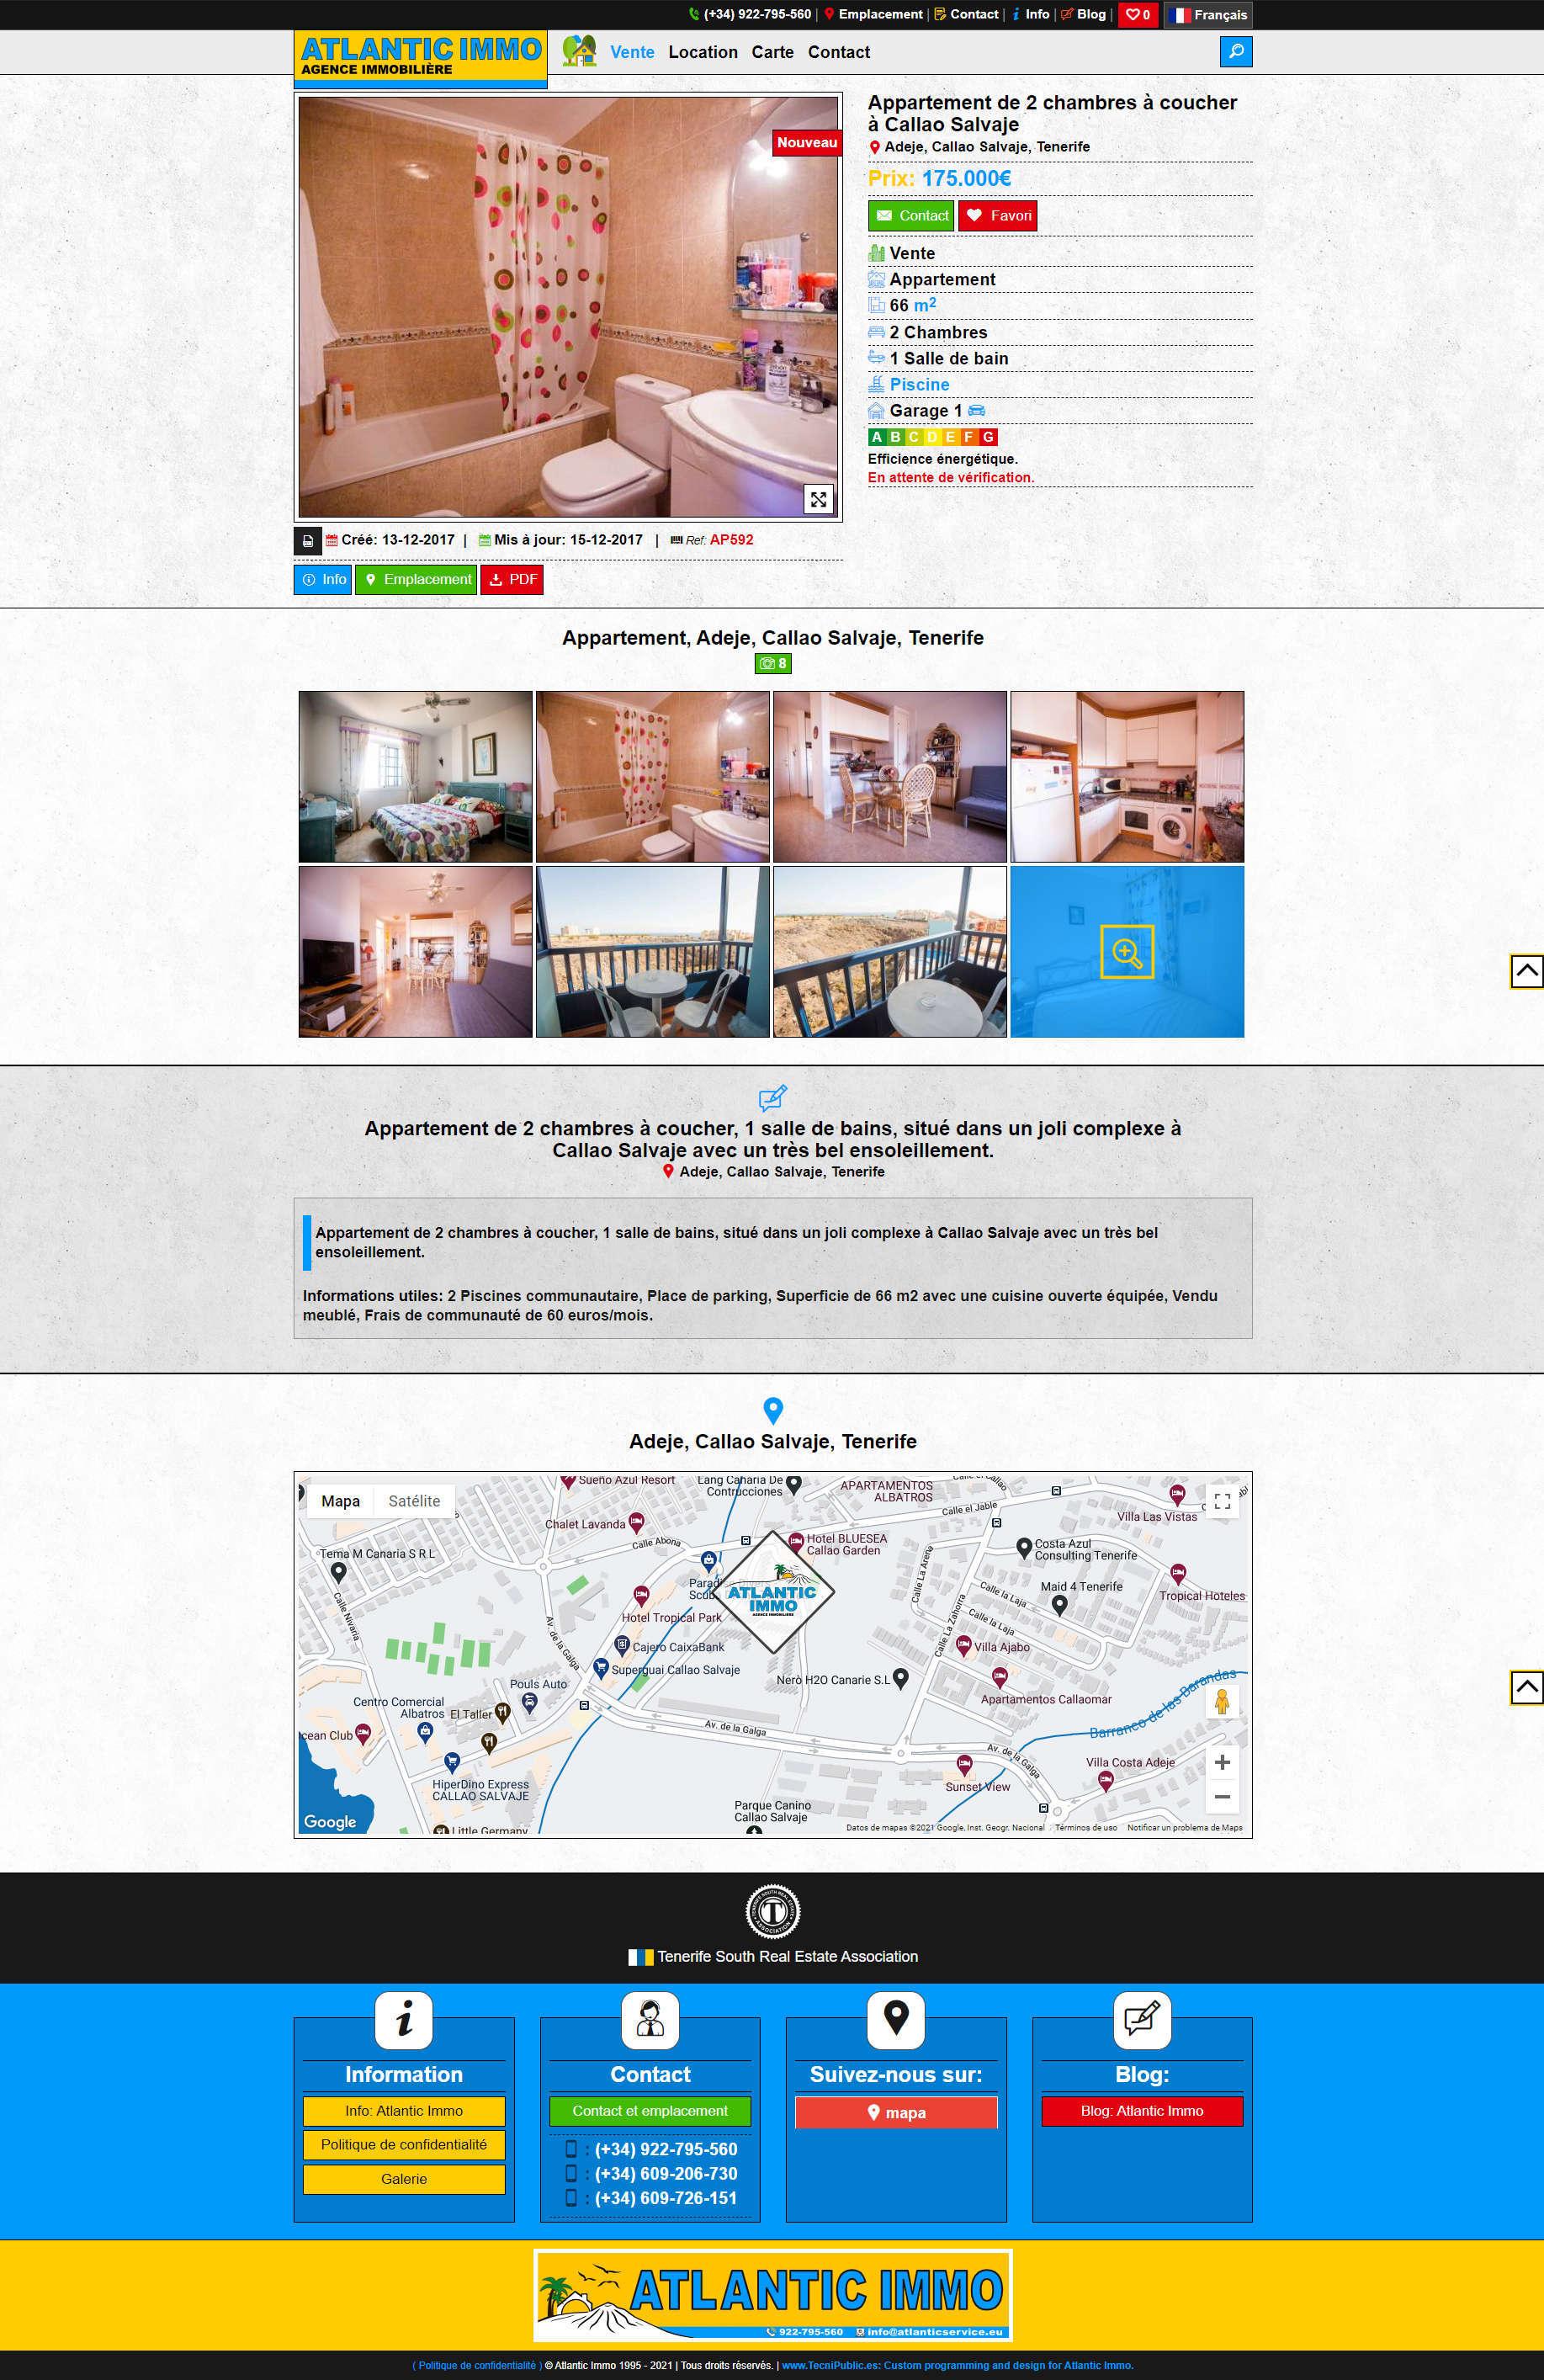 Atlantic Properties - Producto